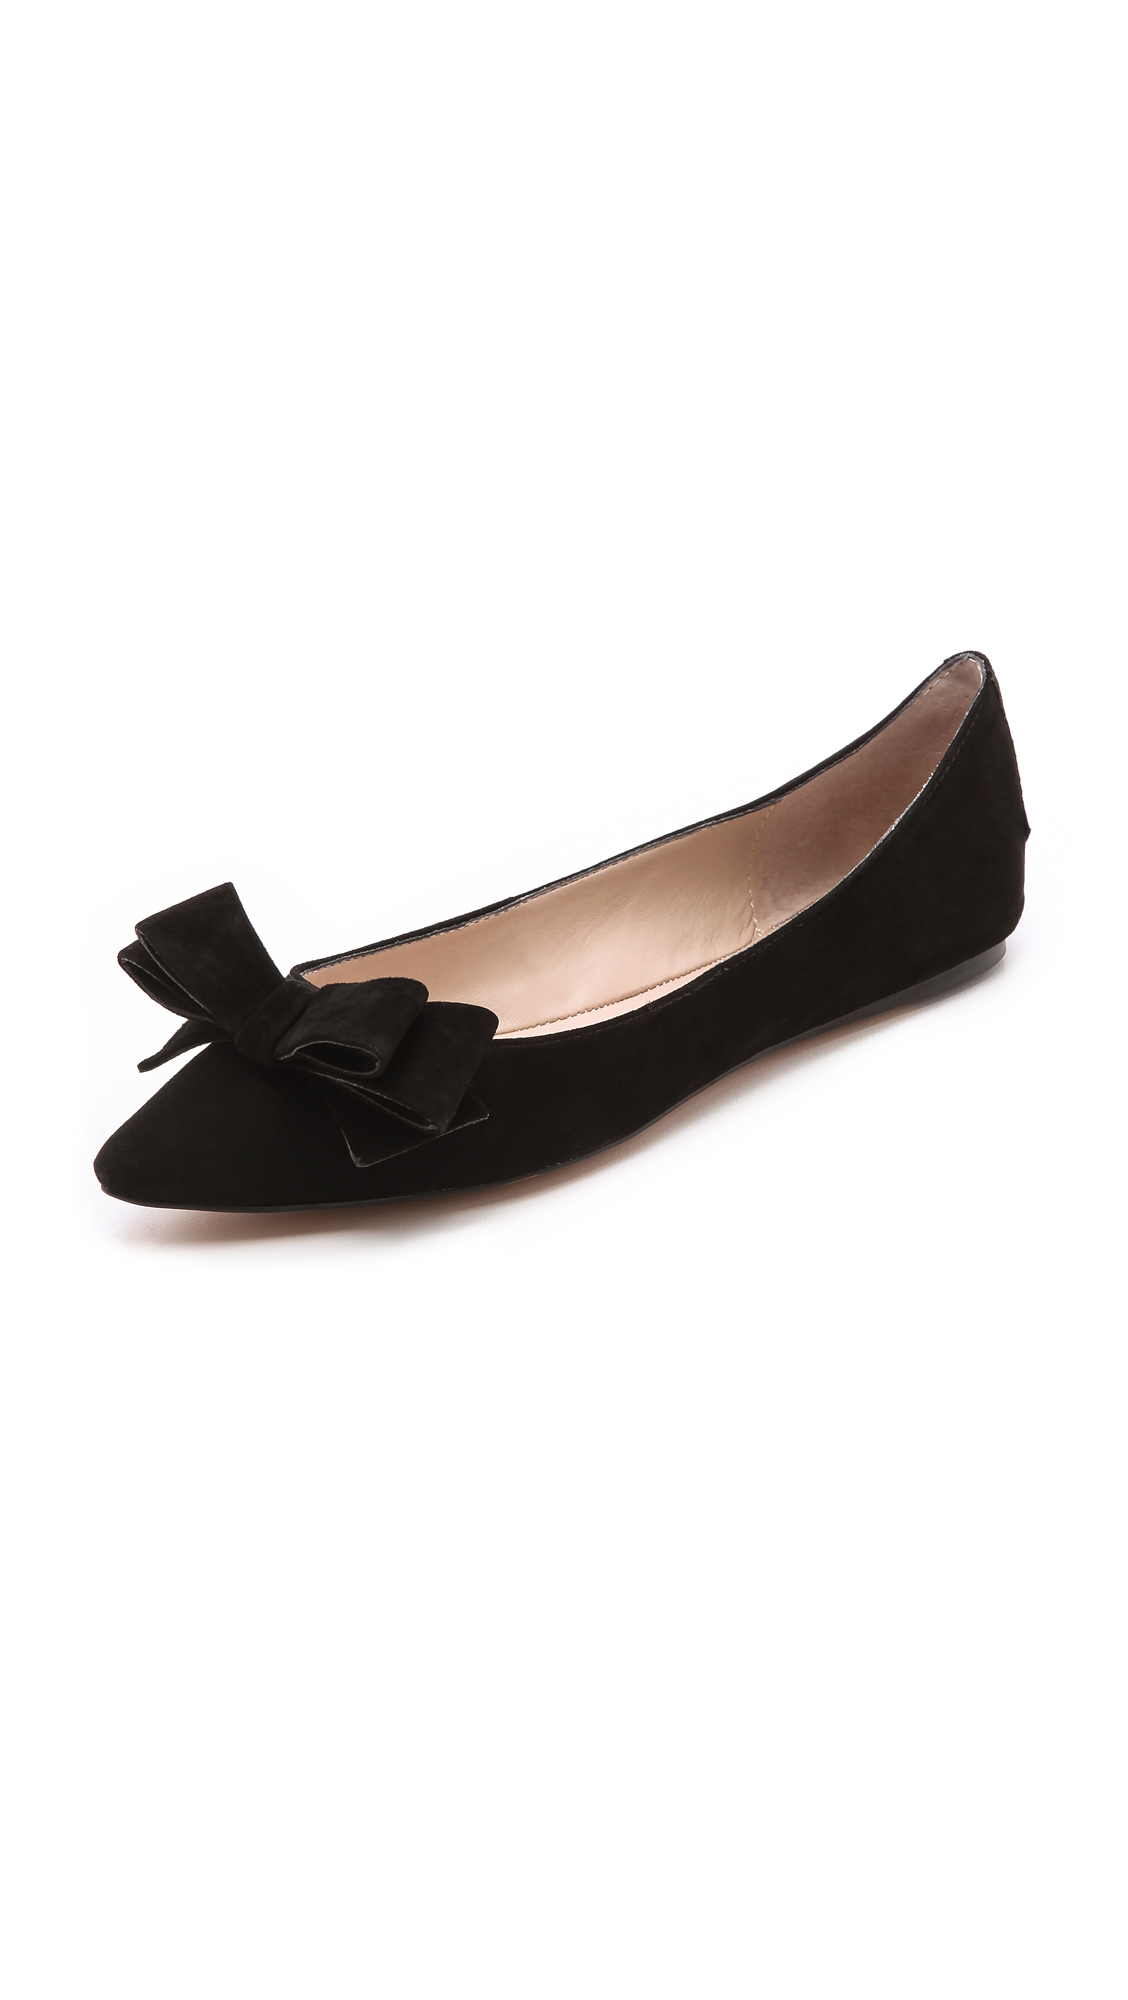 Betsey Johnson Black Bow Shoes